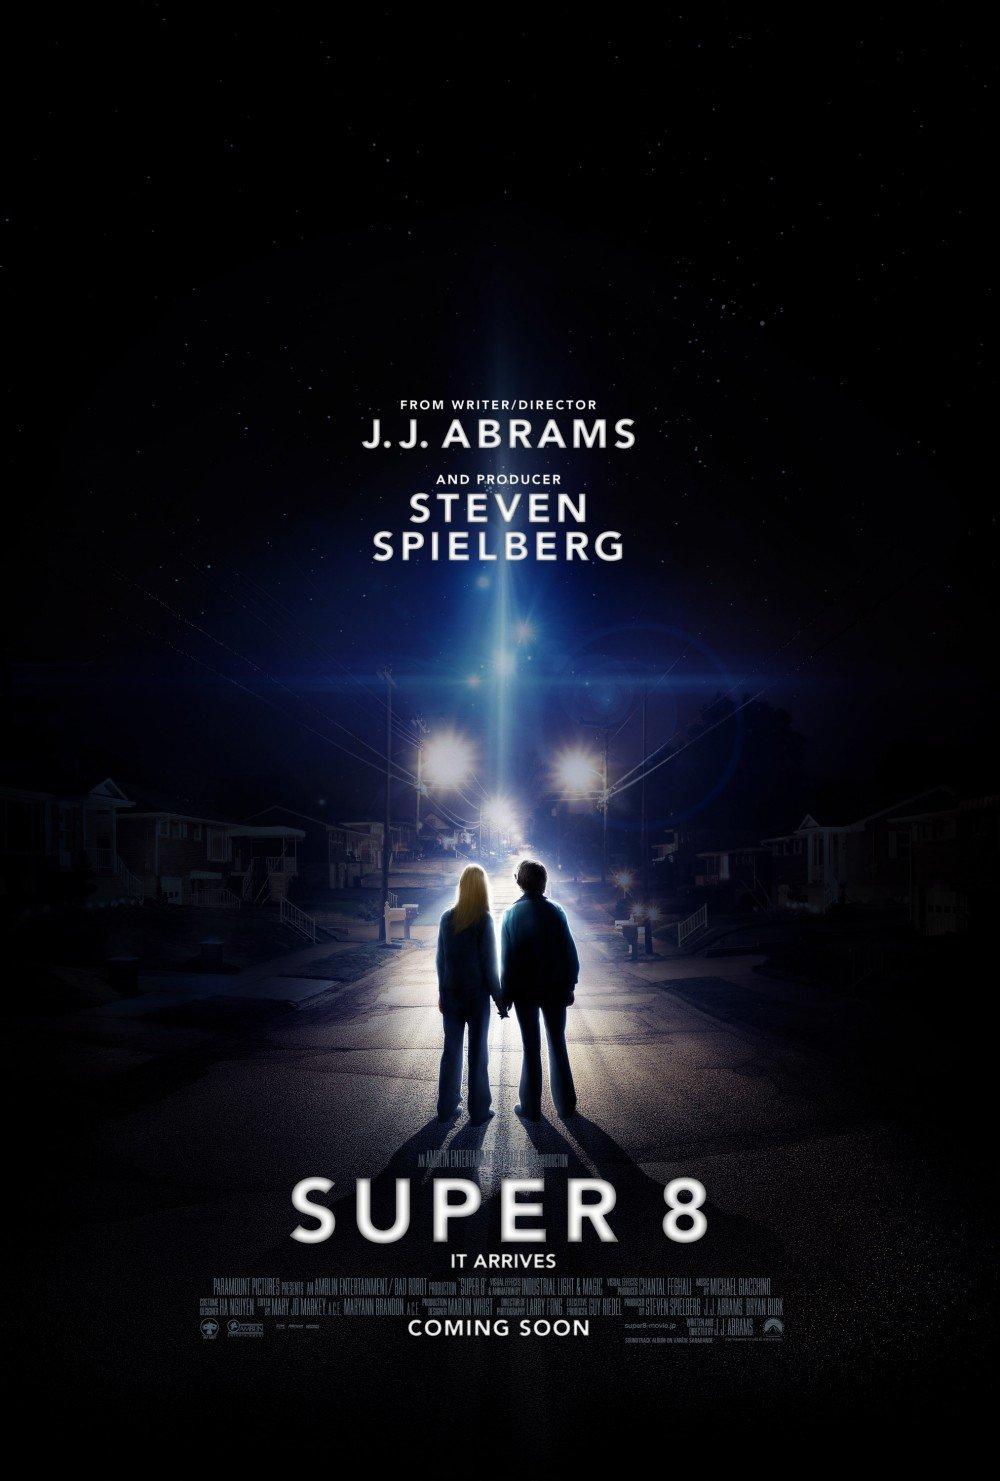 Super 8 - Movie Poster #1 (Original)